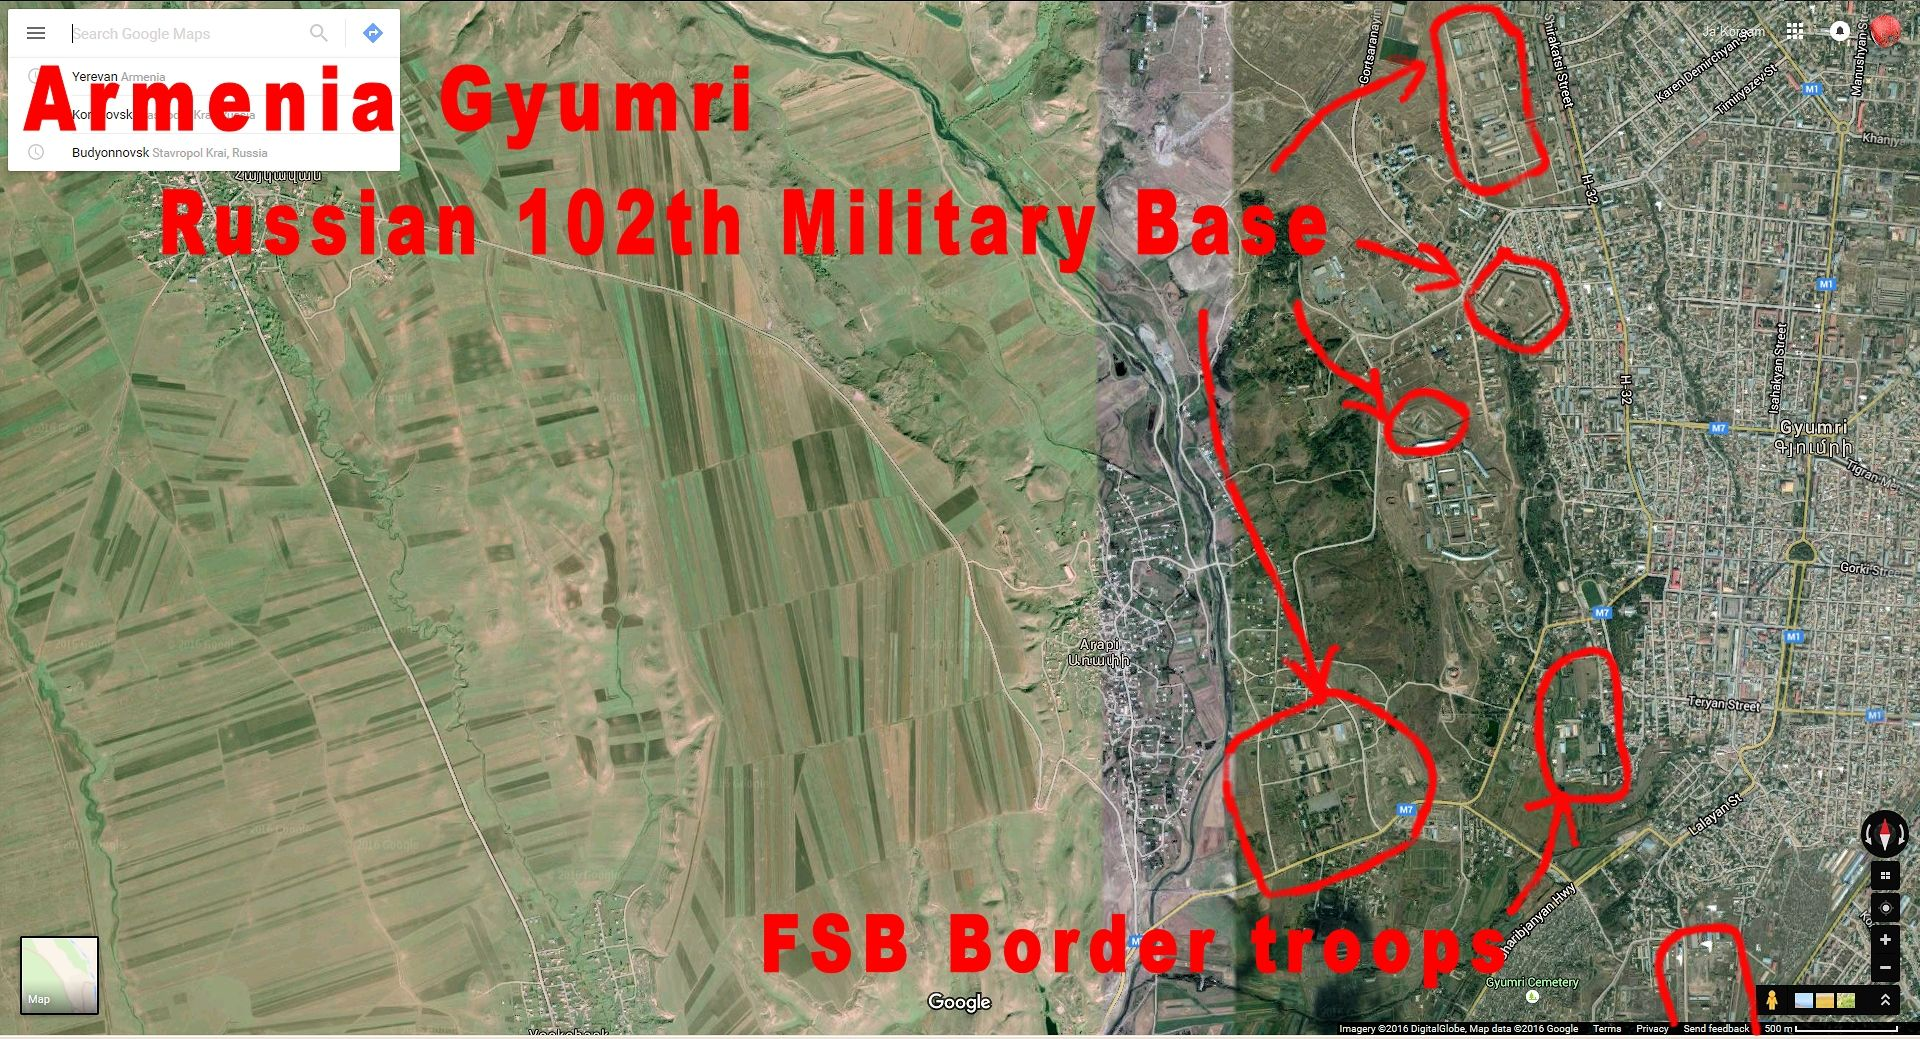 Gyumri Armenia 102th Russian military Base Maps Screencaptures